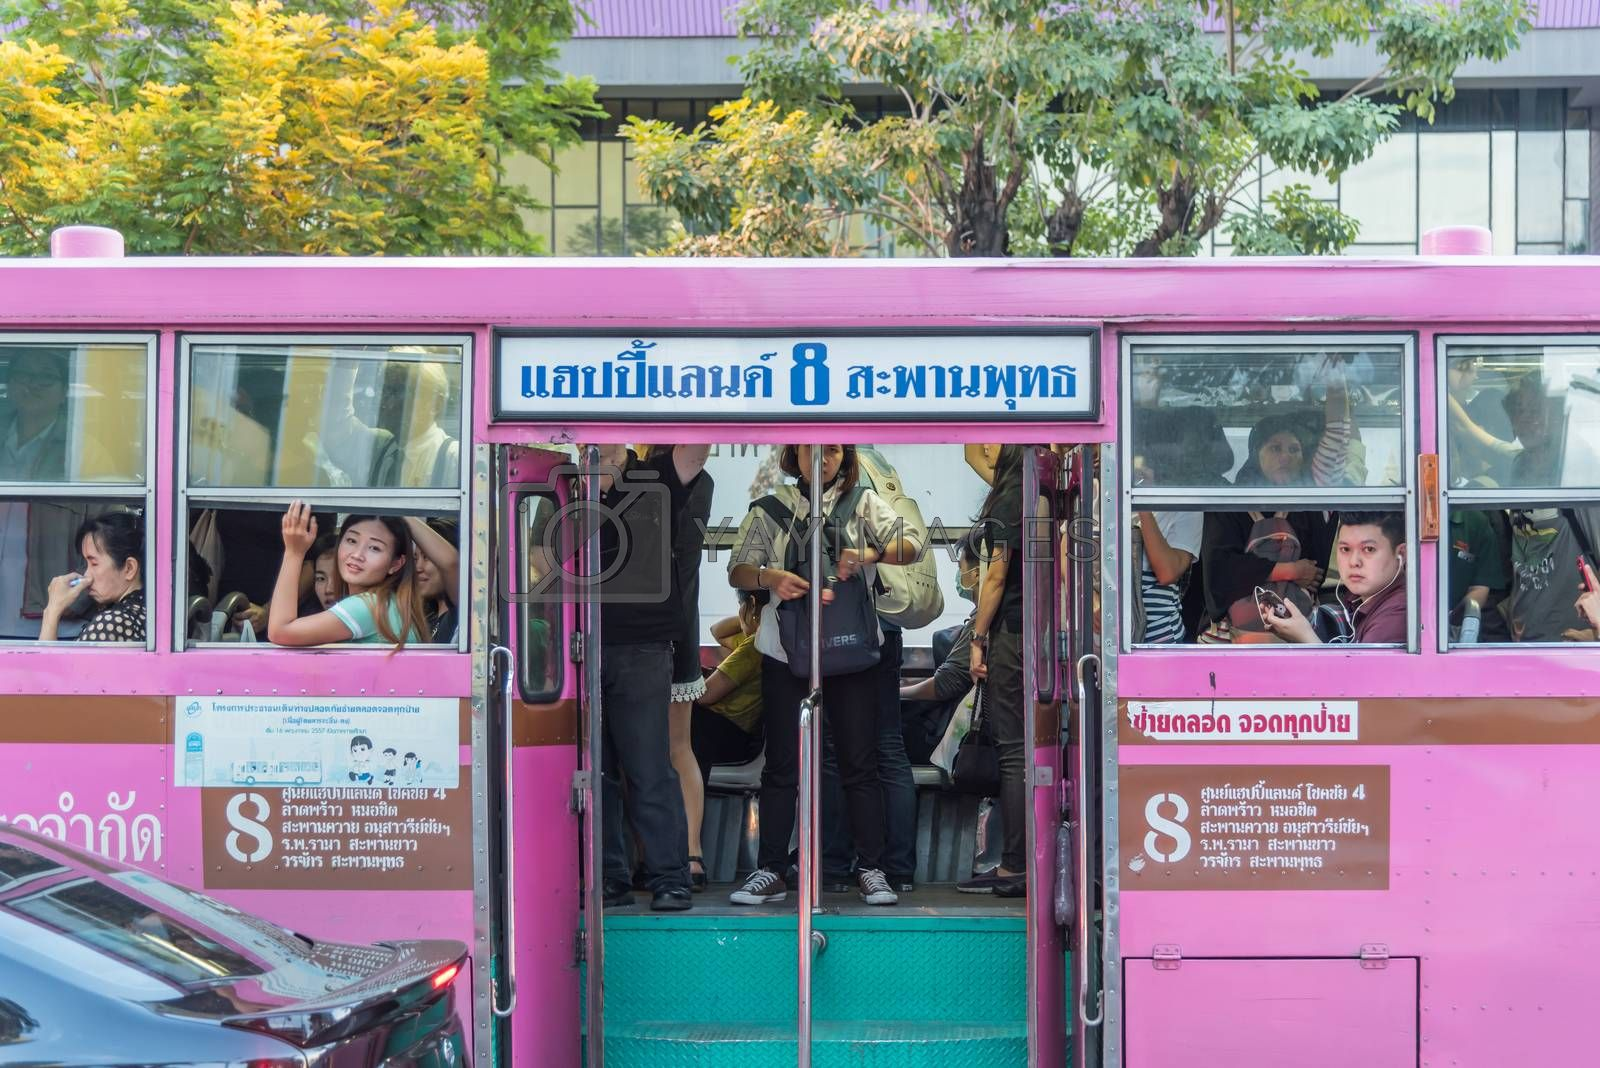 Bus in Bangkok Thailand by PongMoji